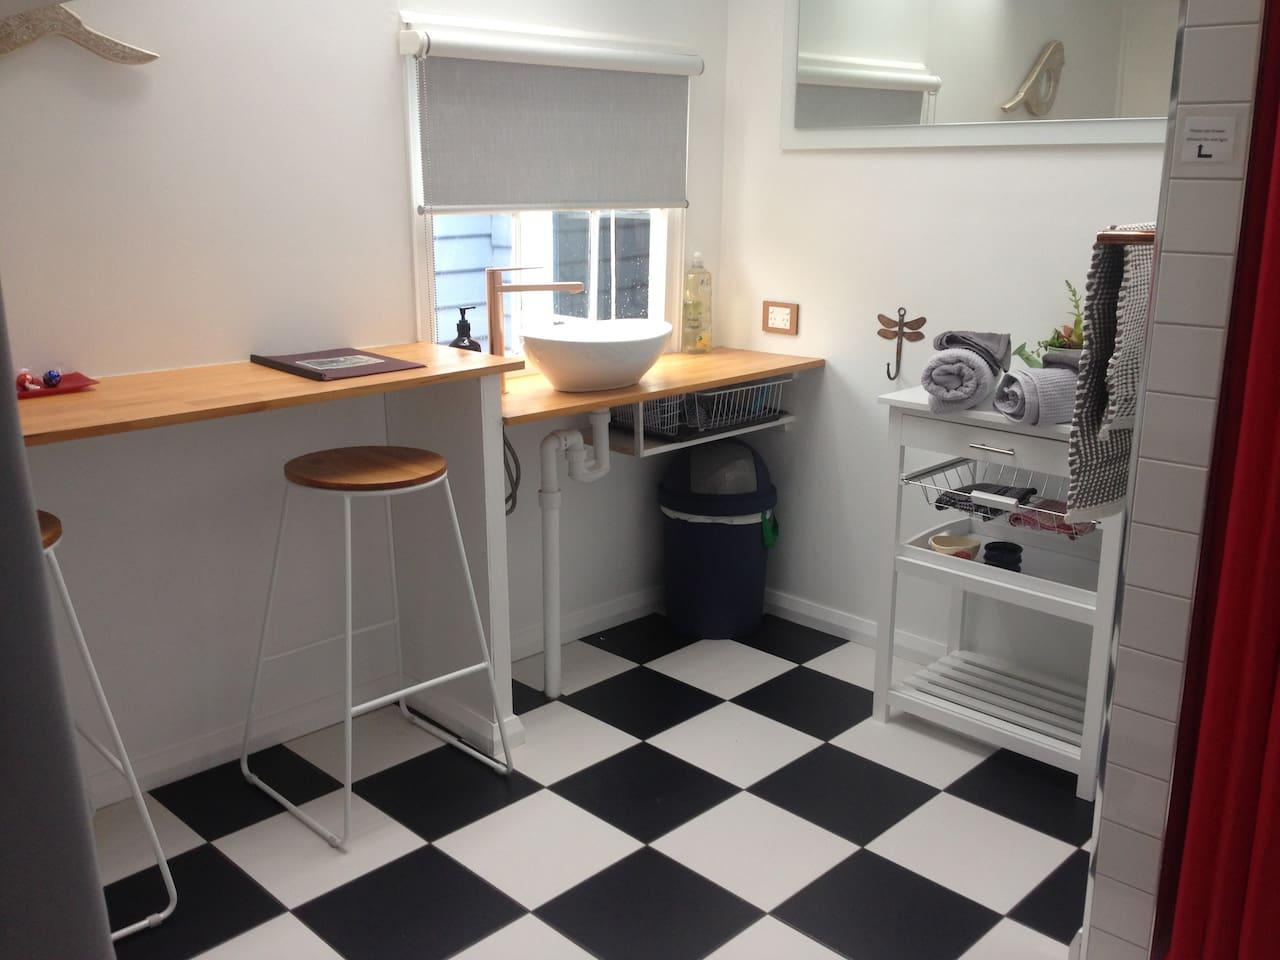 Stylish little kitchenette